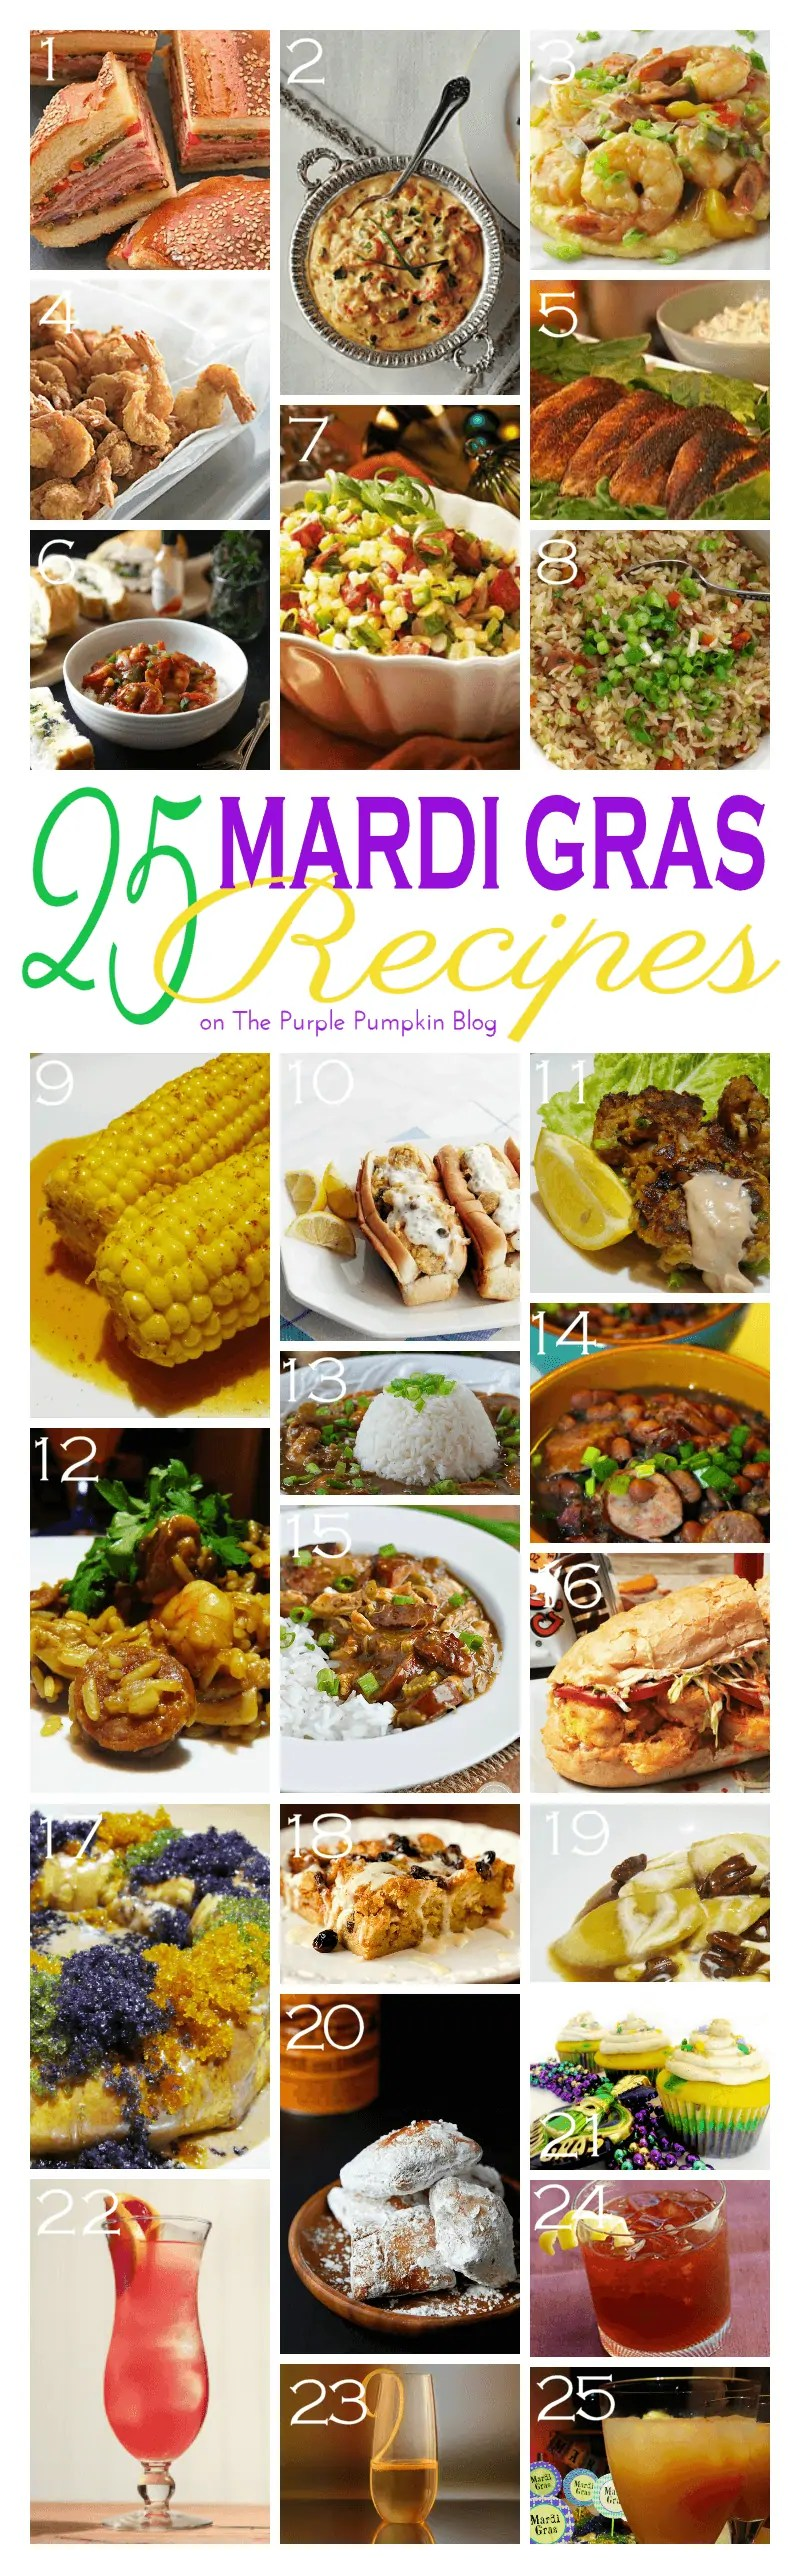 25 Mardi Gras Recipes on The Purple Pumpkin Blog